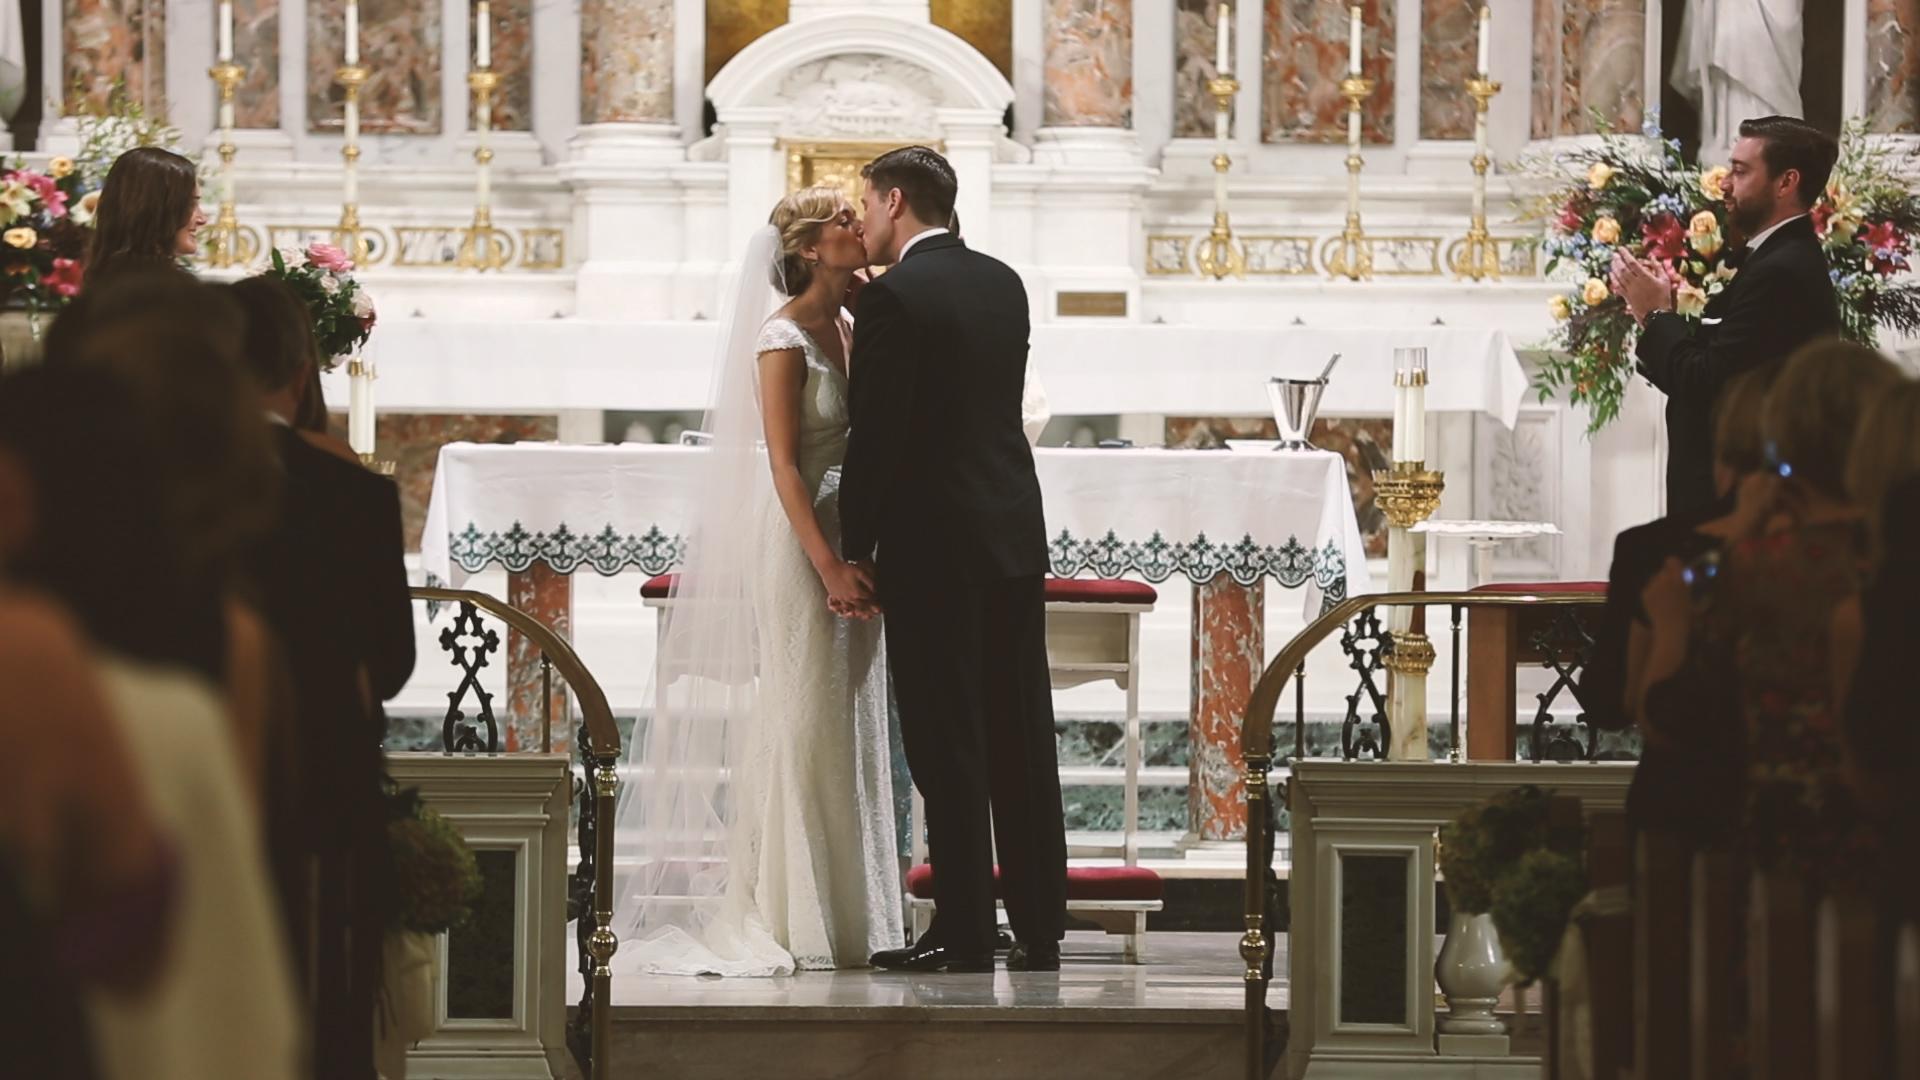 First Kiss - Bride Film